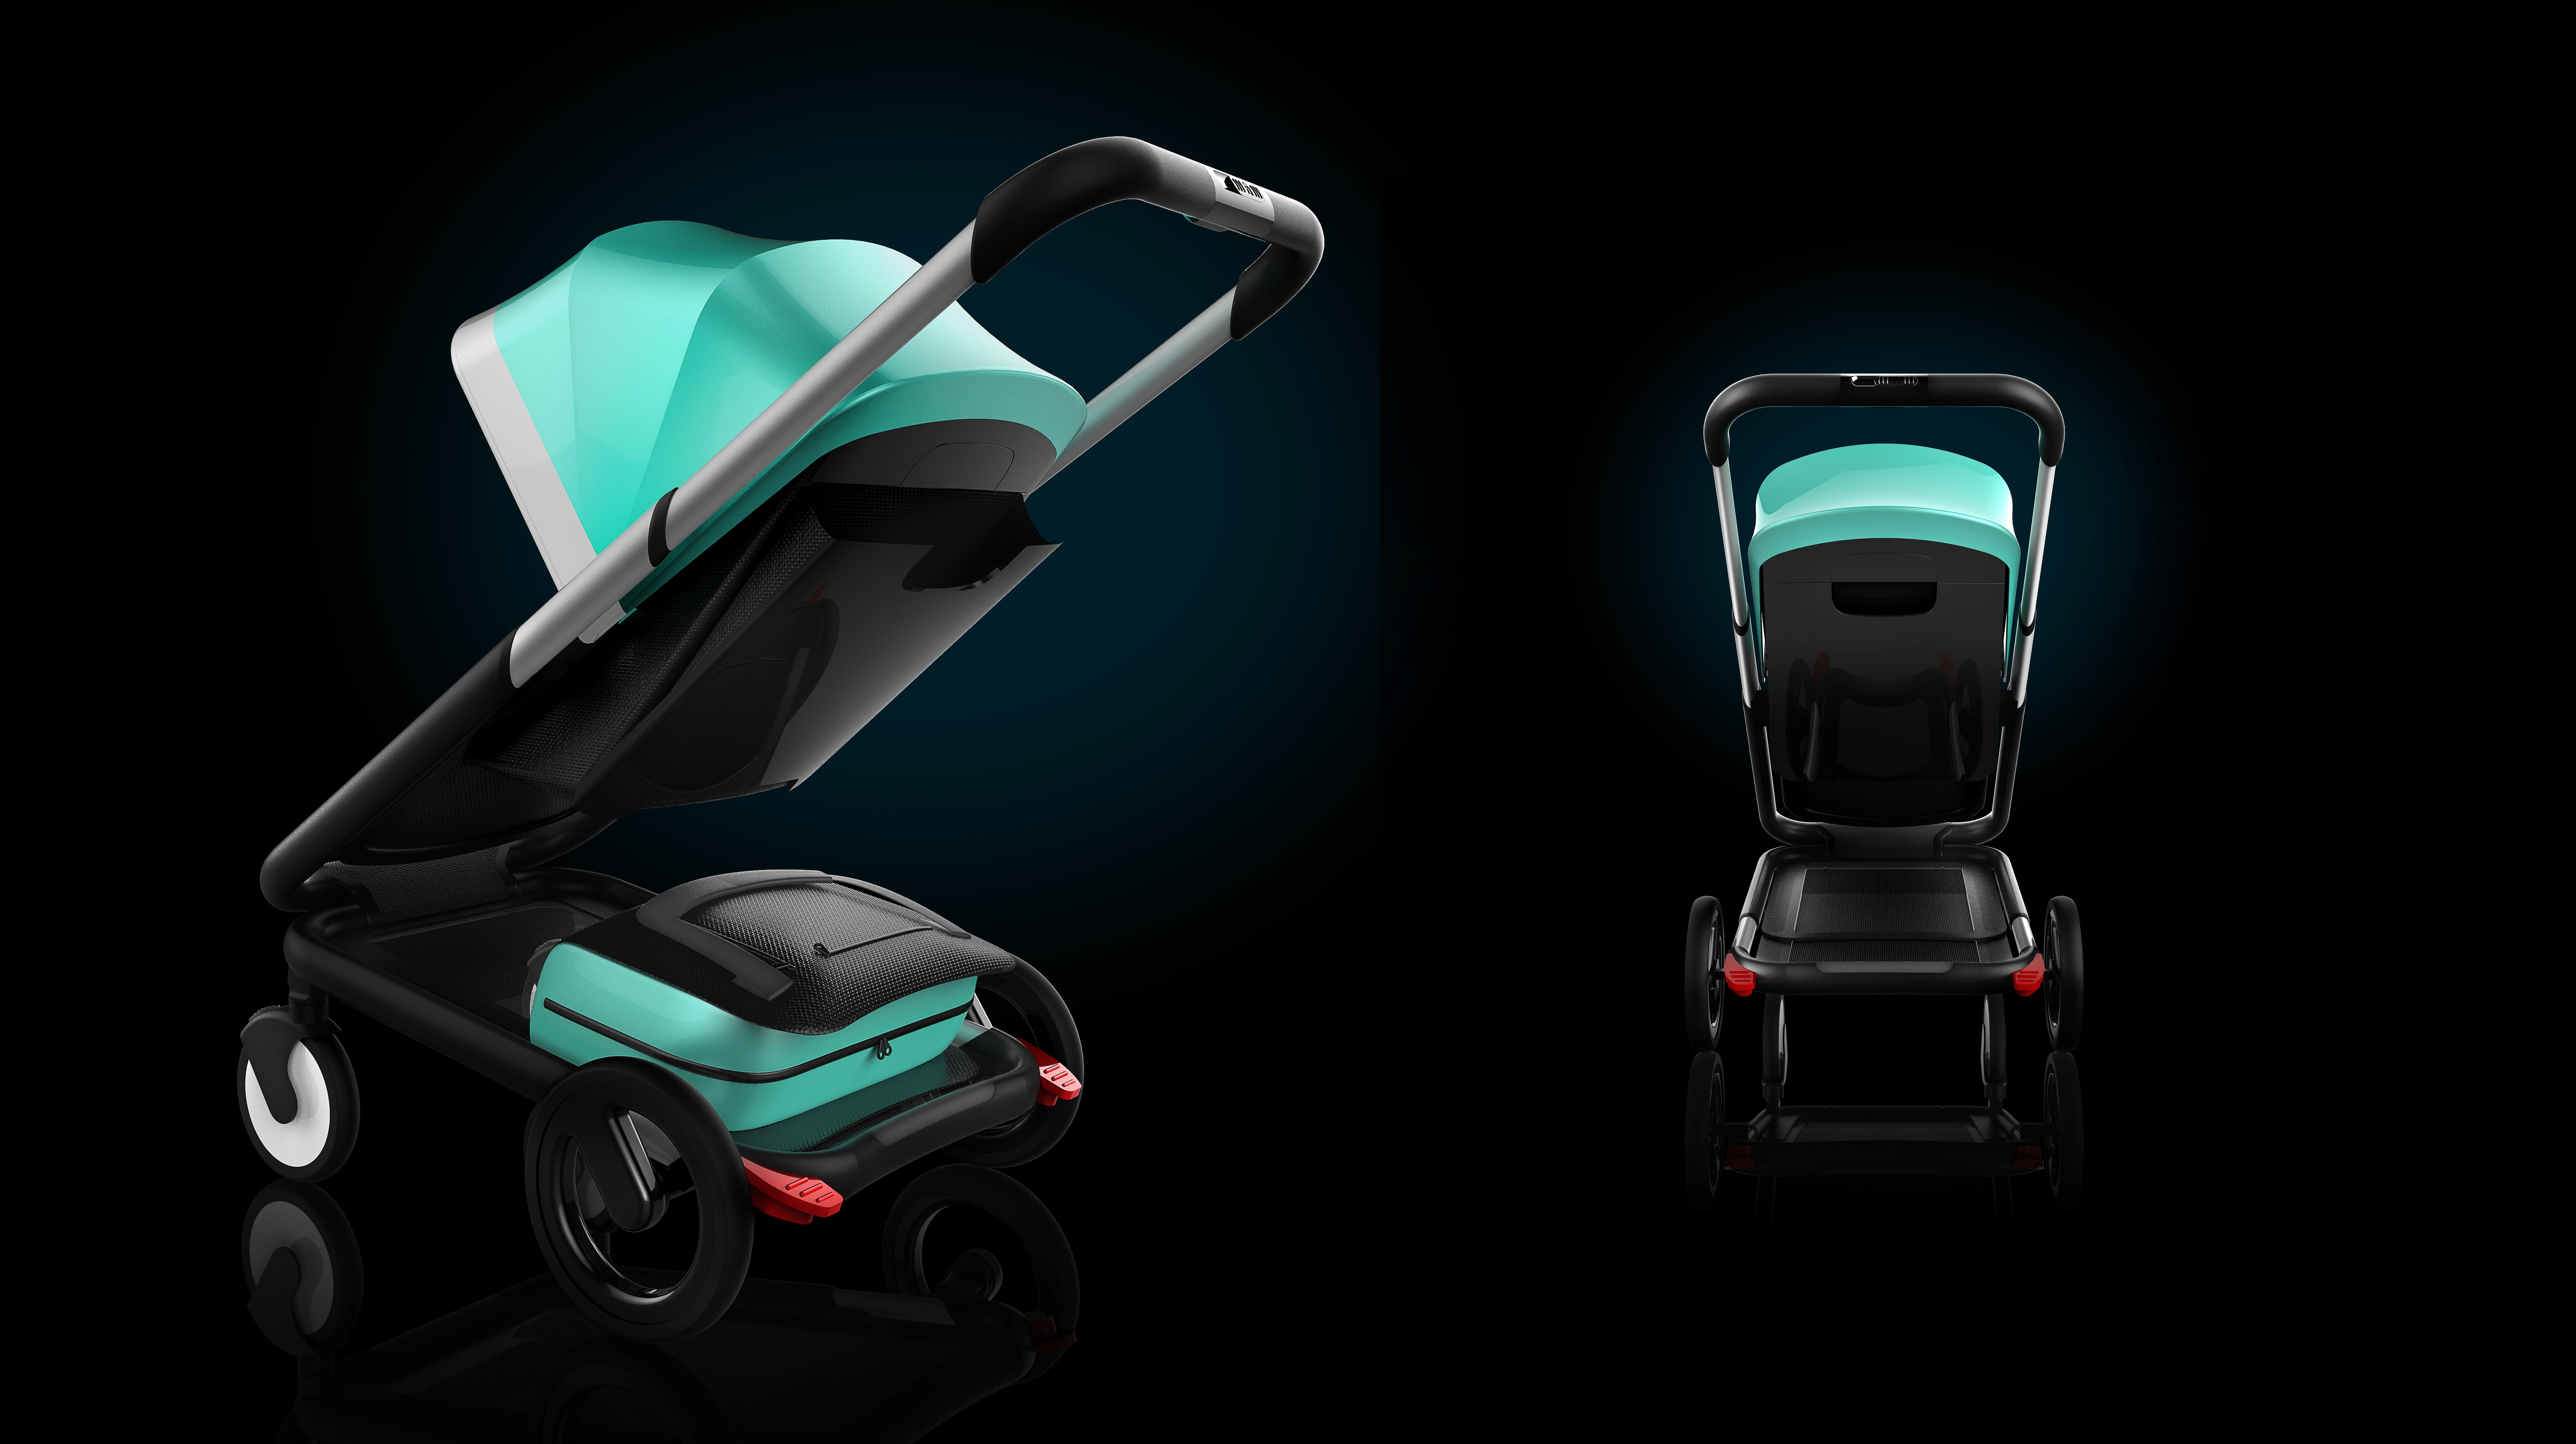 baby buggy concept design